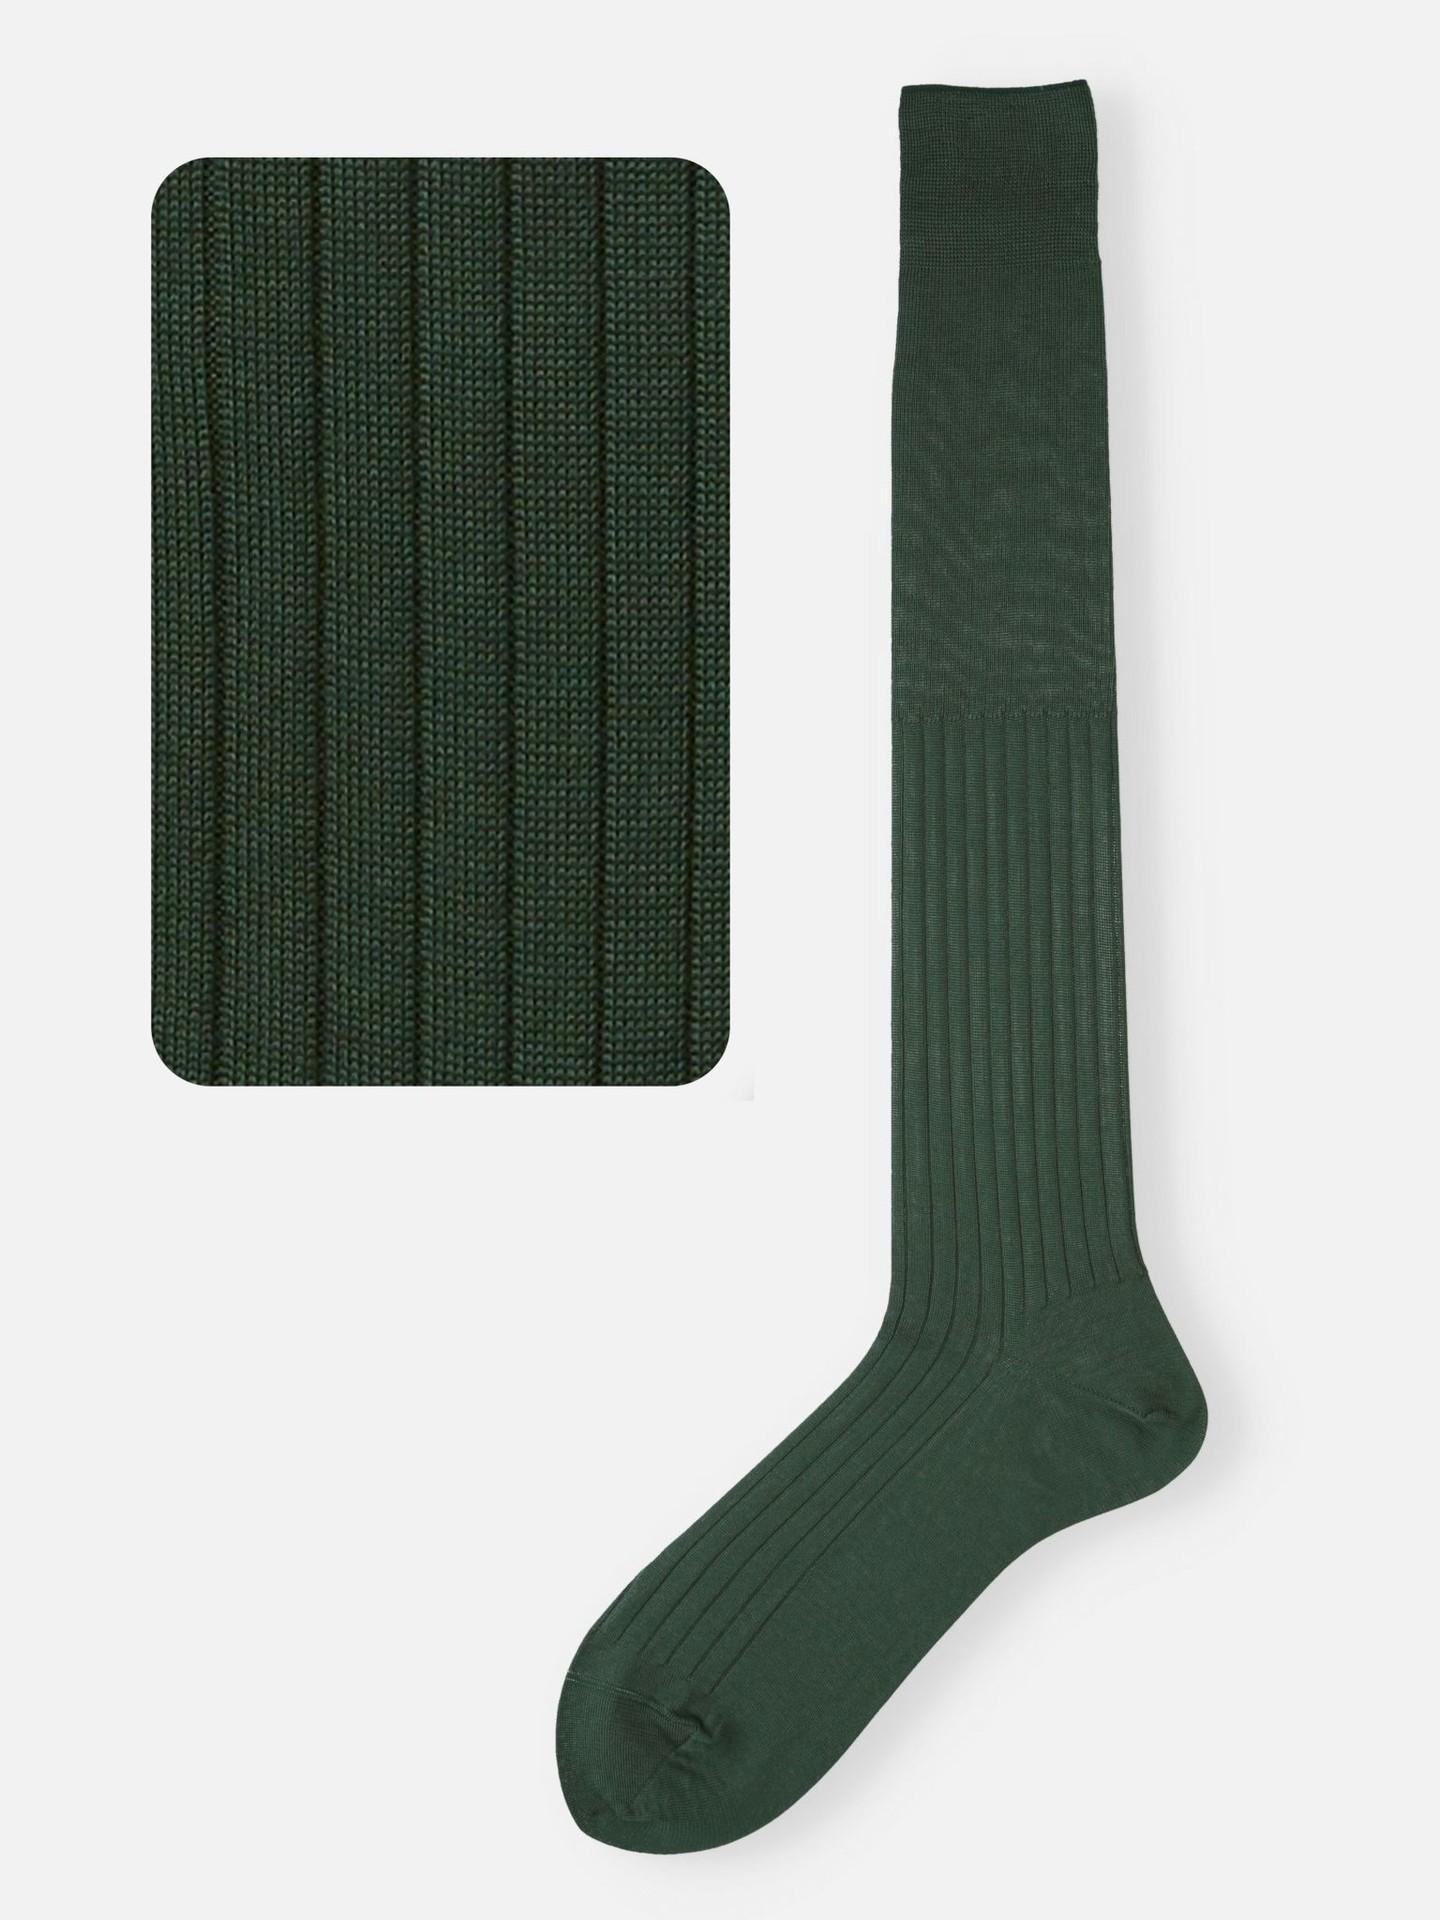 Hohe Socken in Dunkelgrün